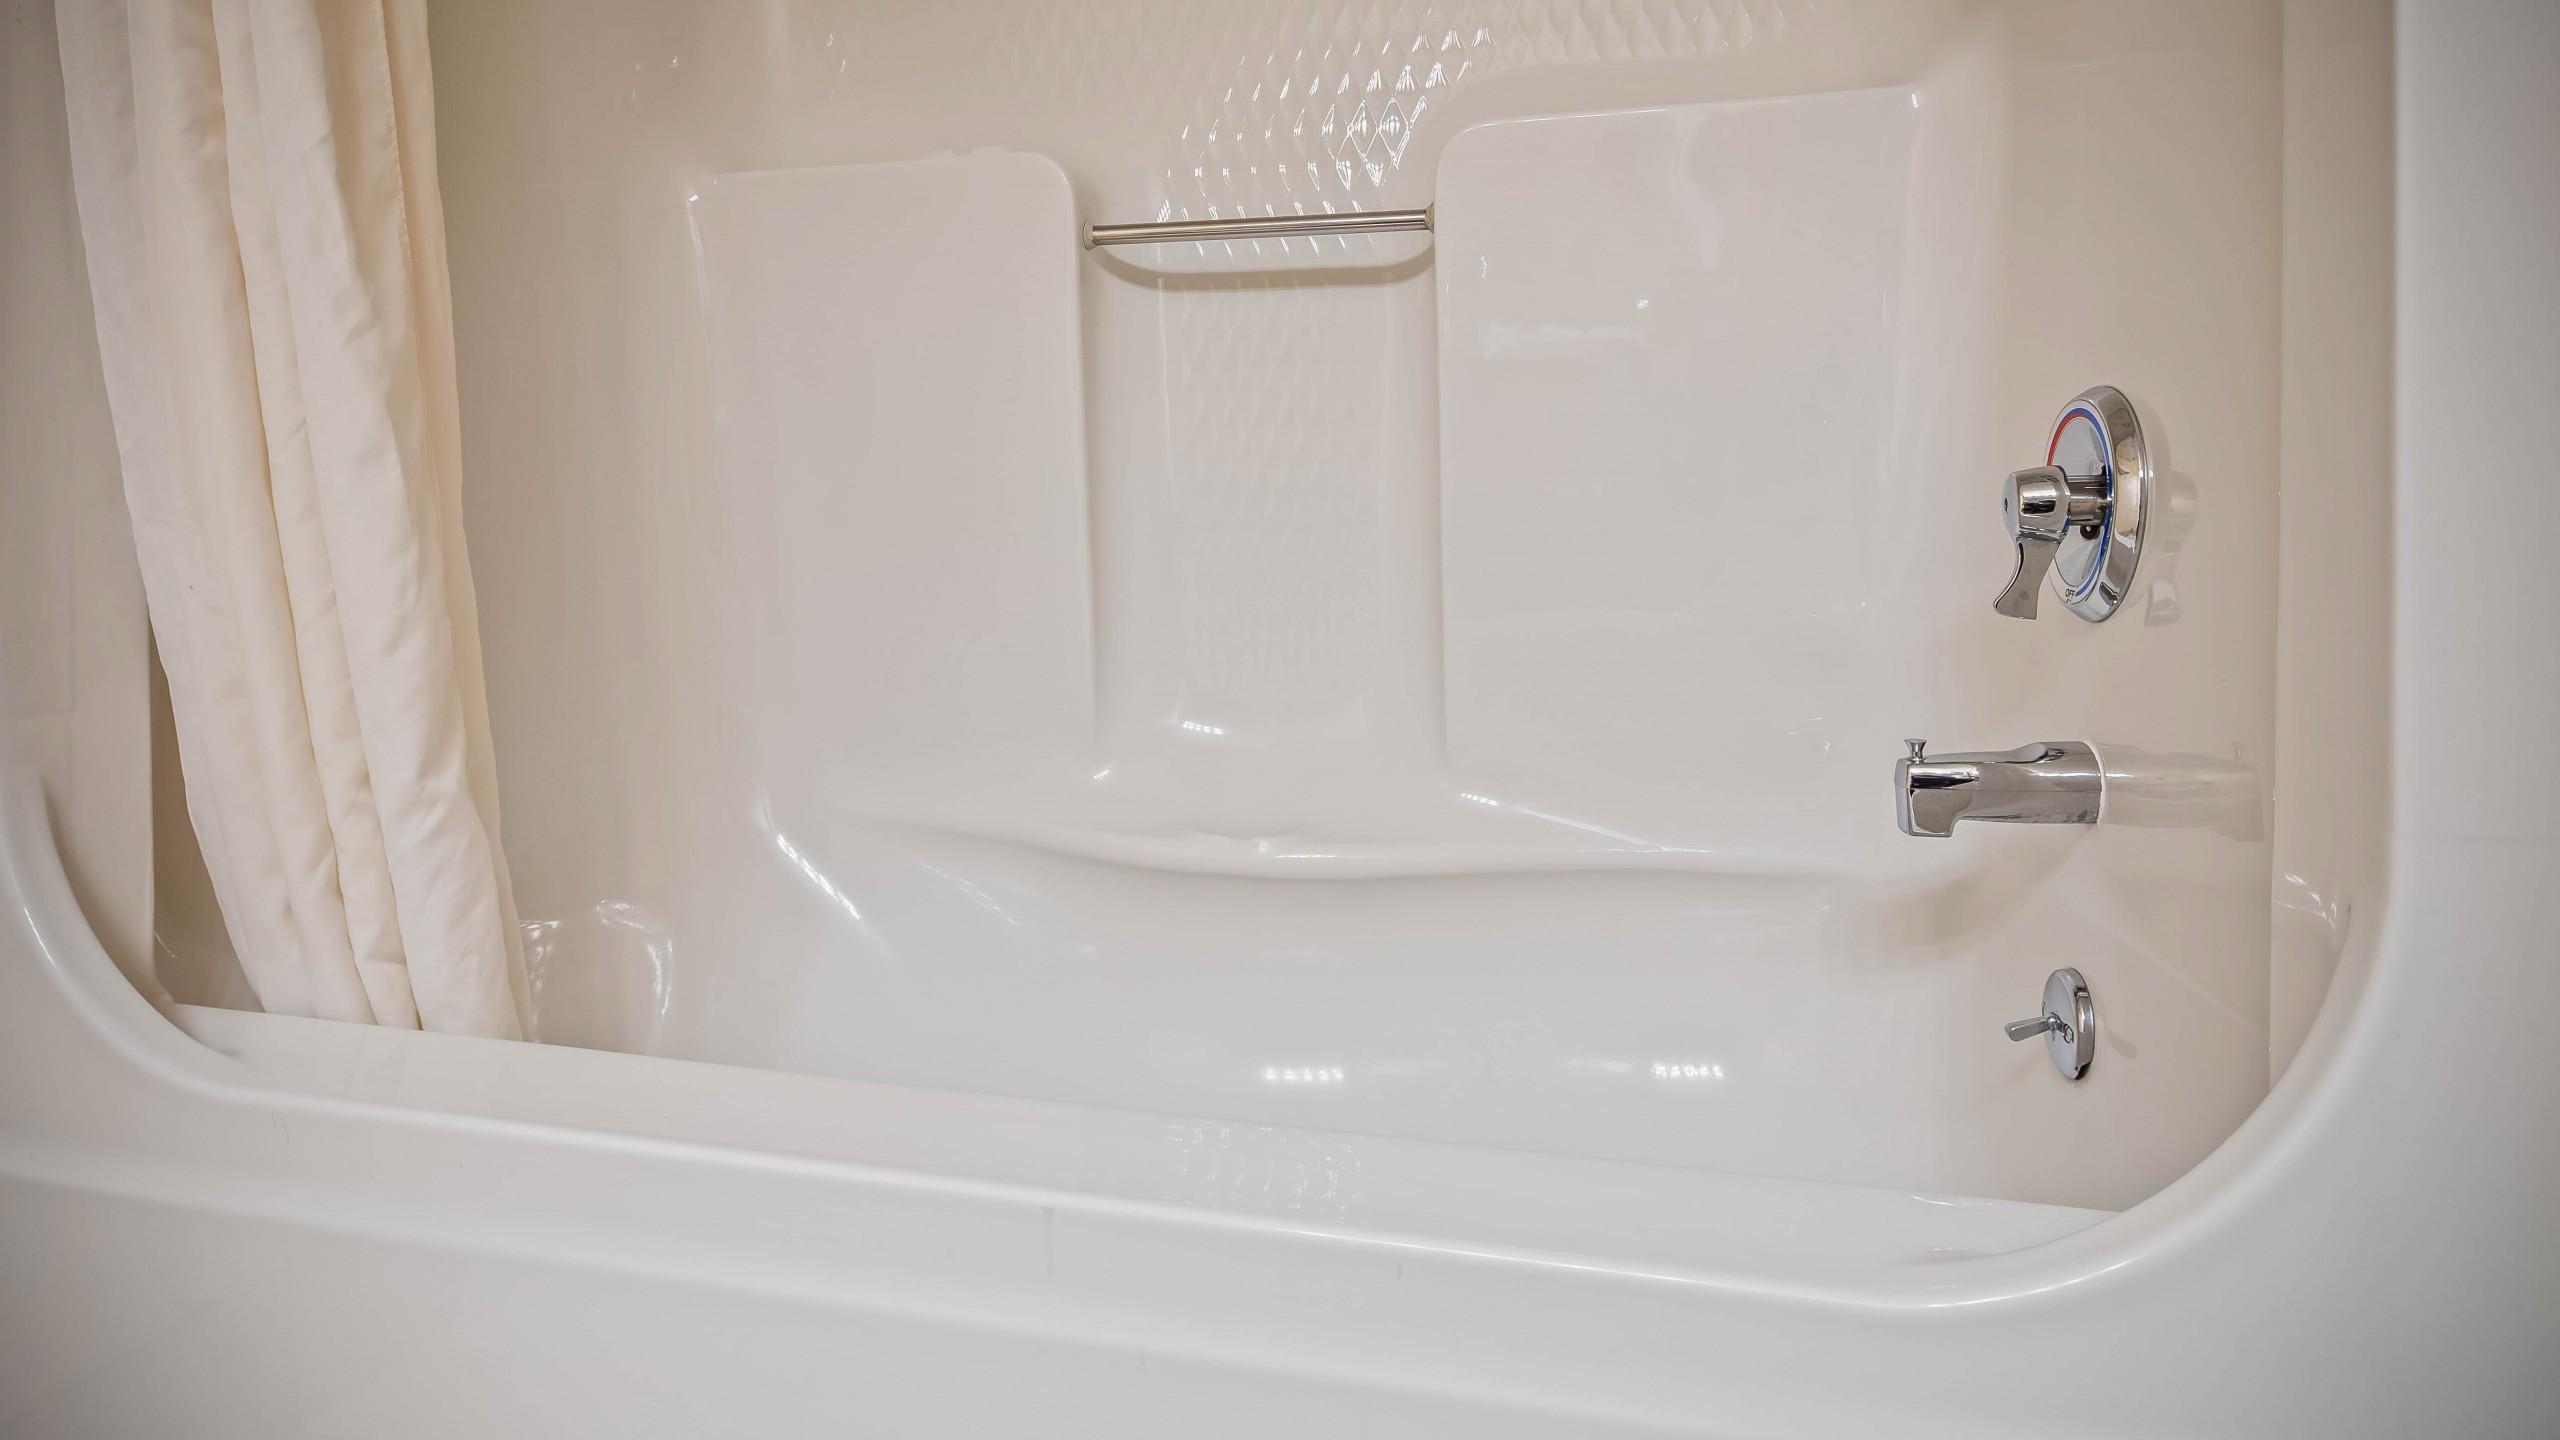 Best Western Center Pointe Inn doubles bathroom